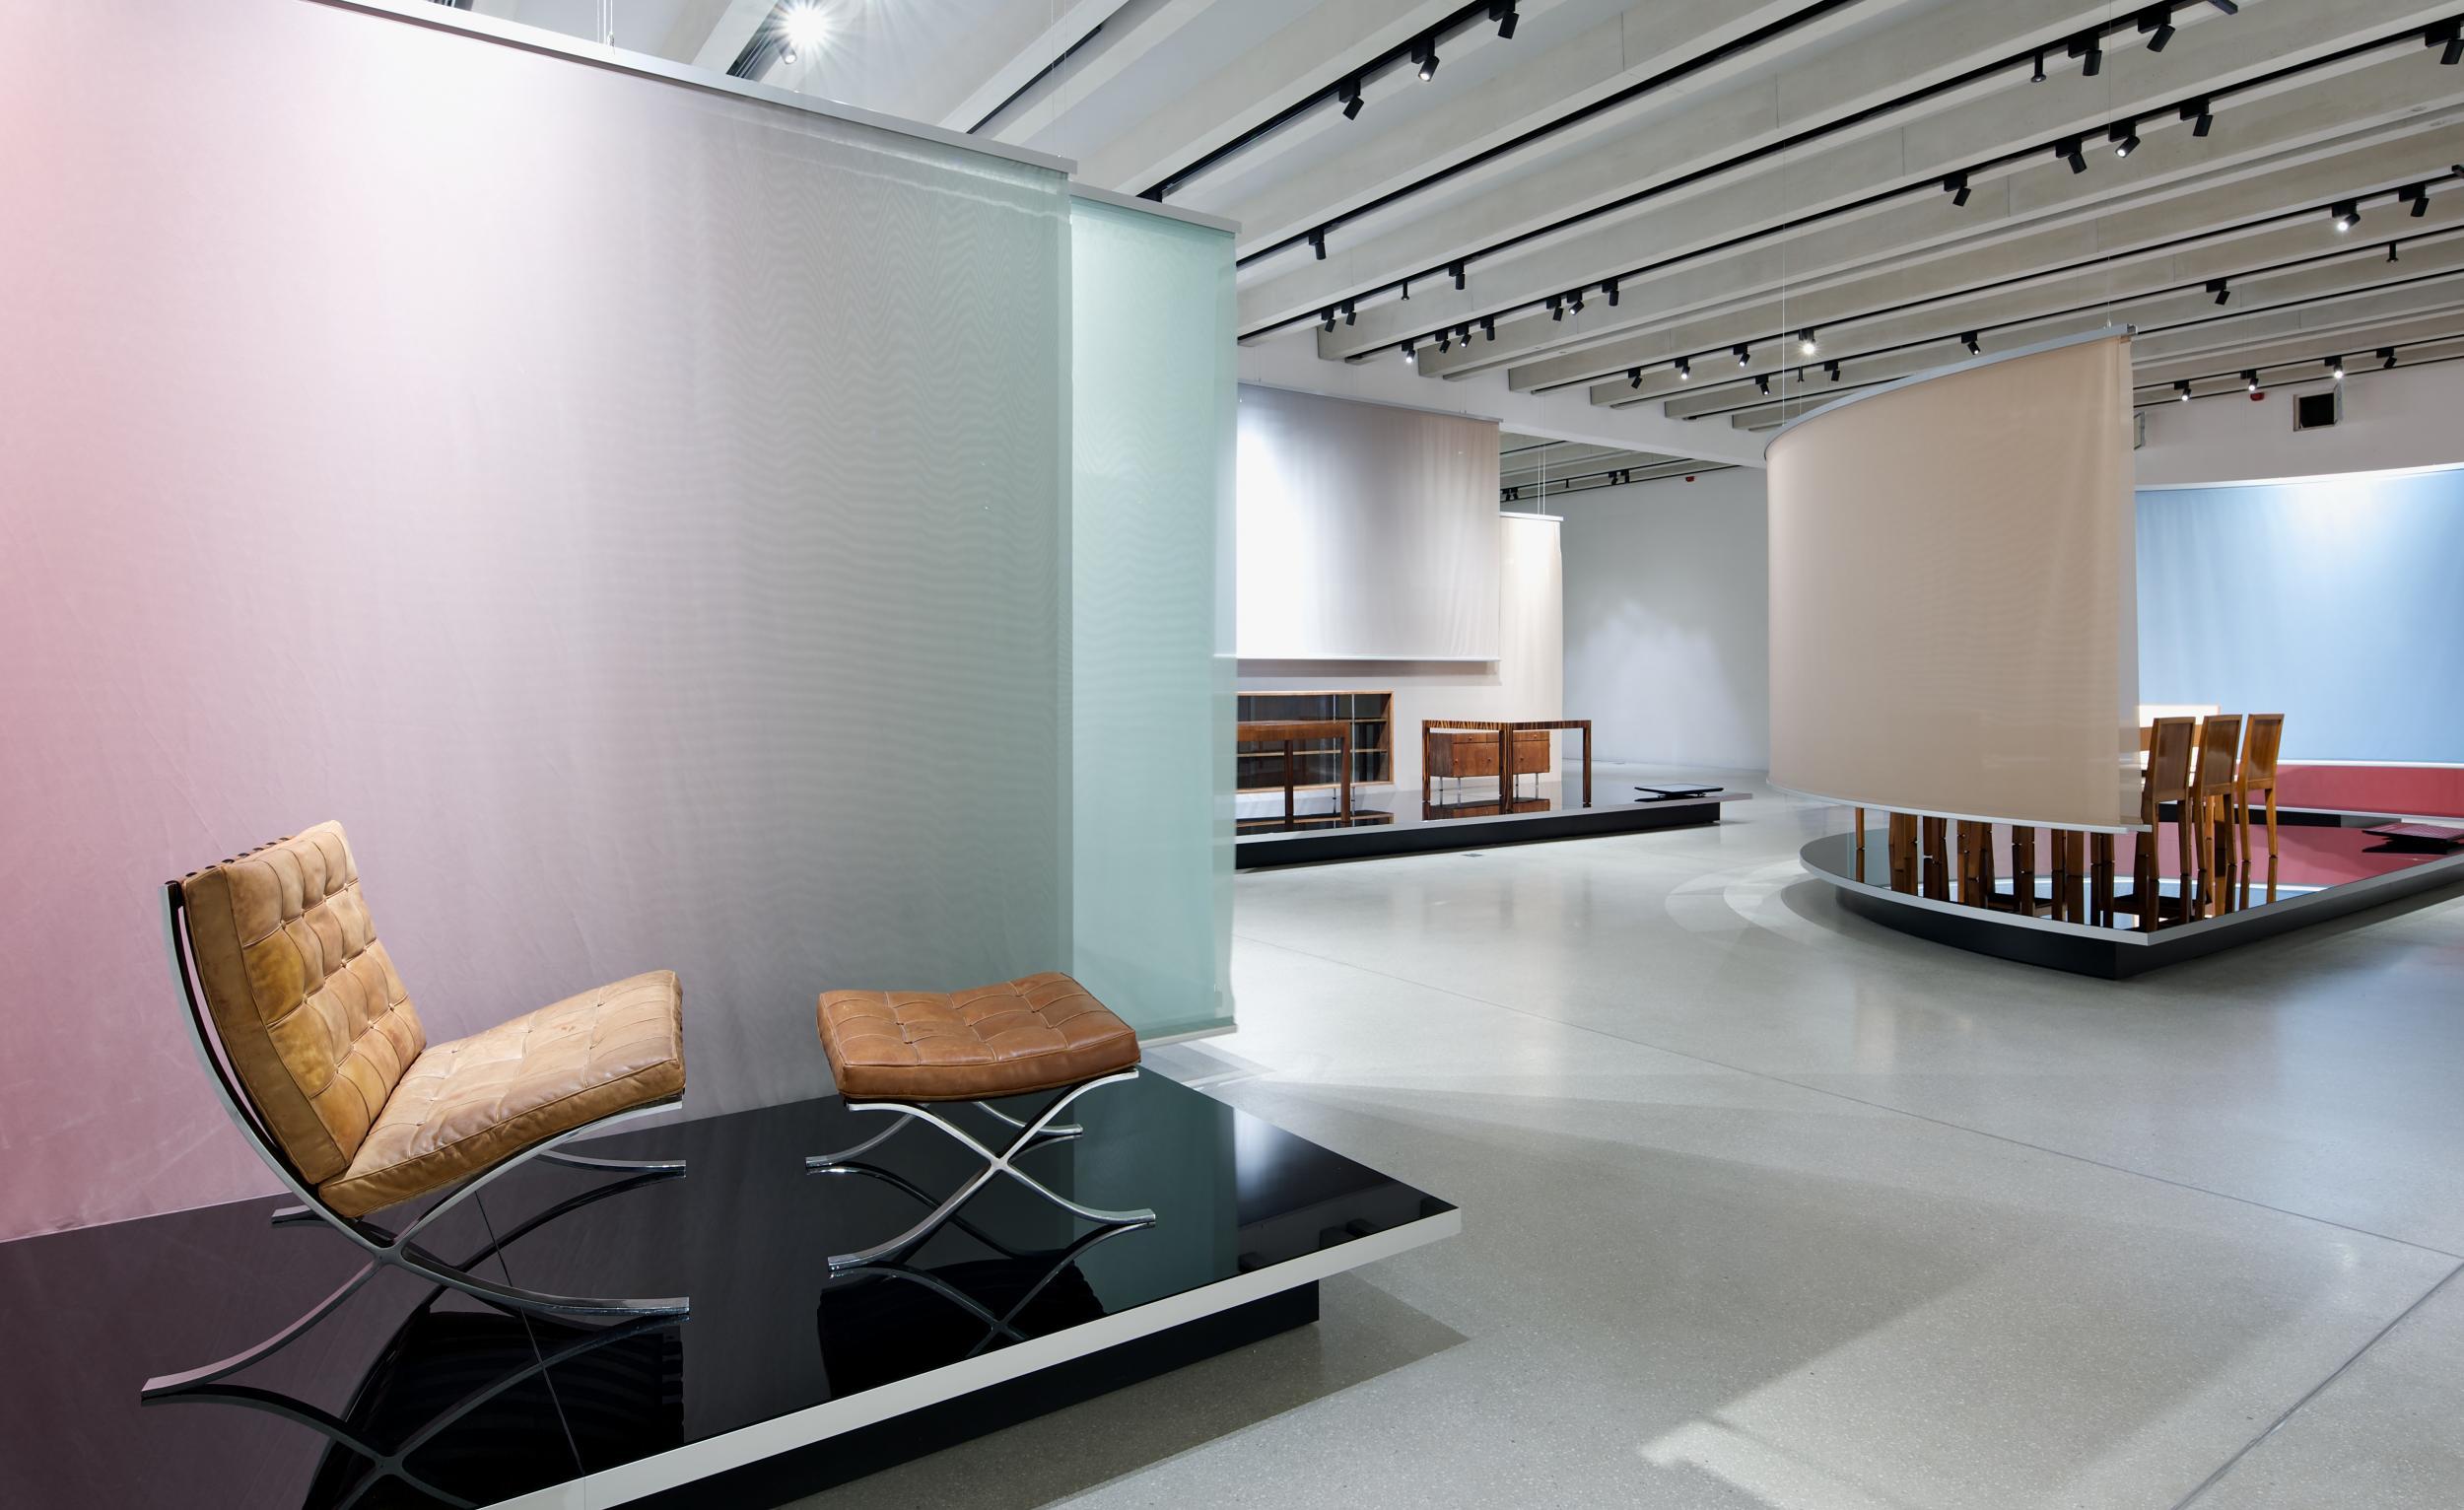 muzeum bauhausu